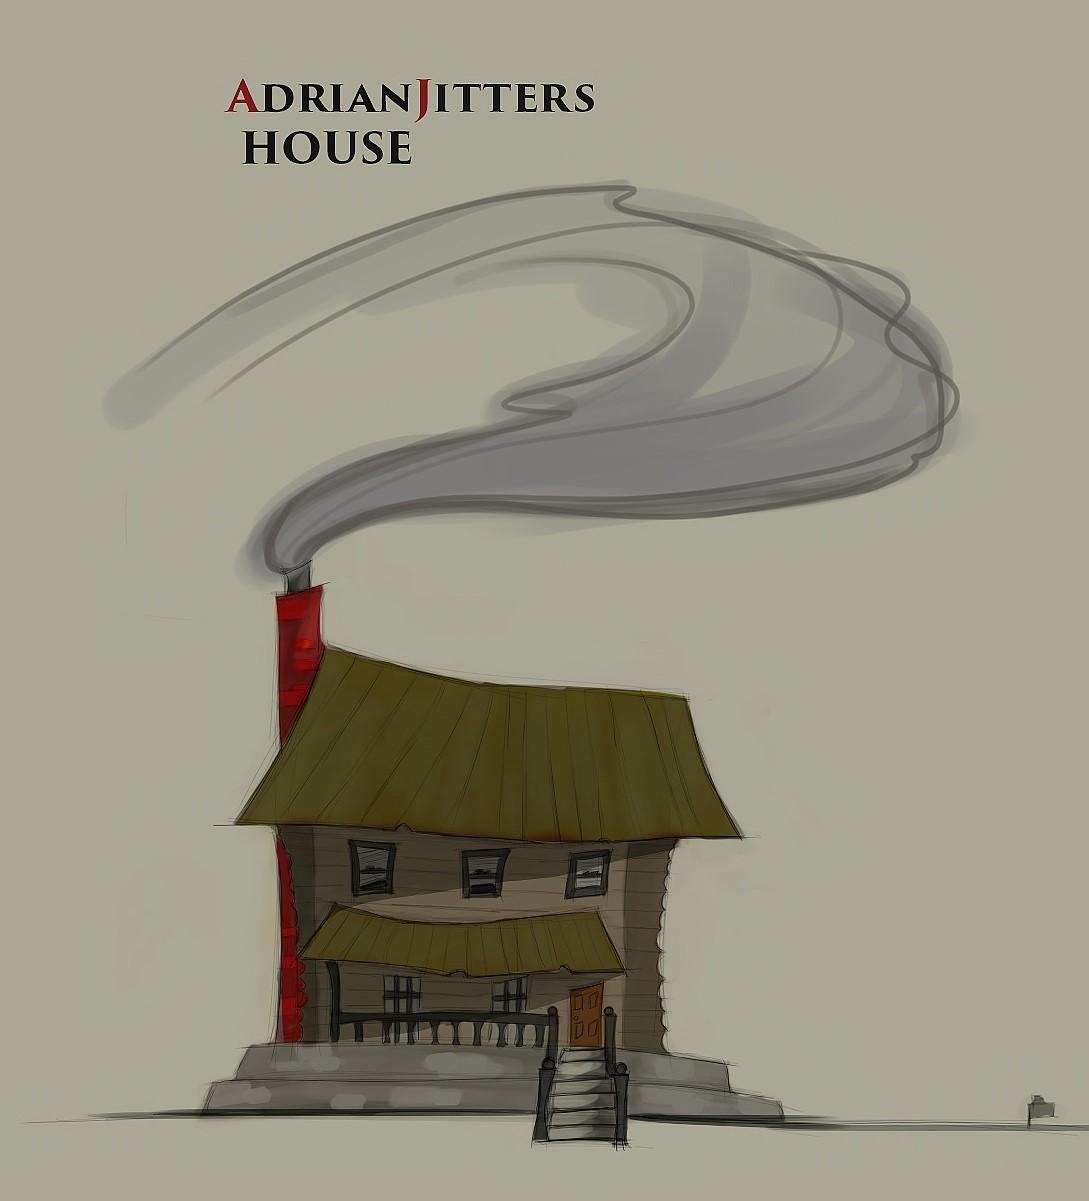 adrians house.jpg